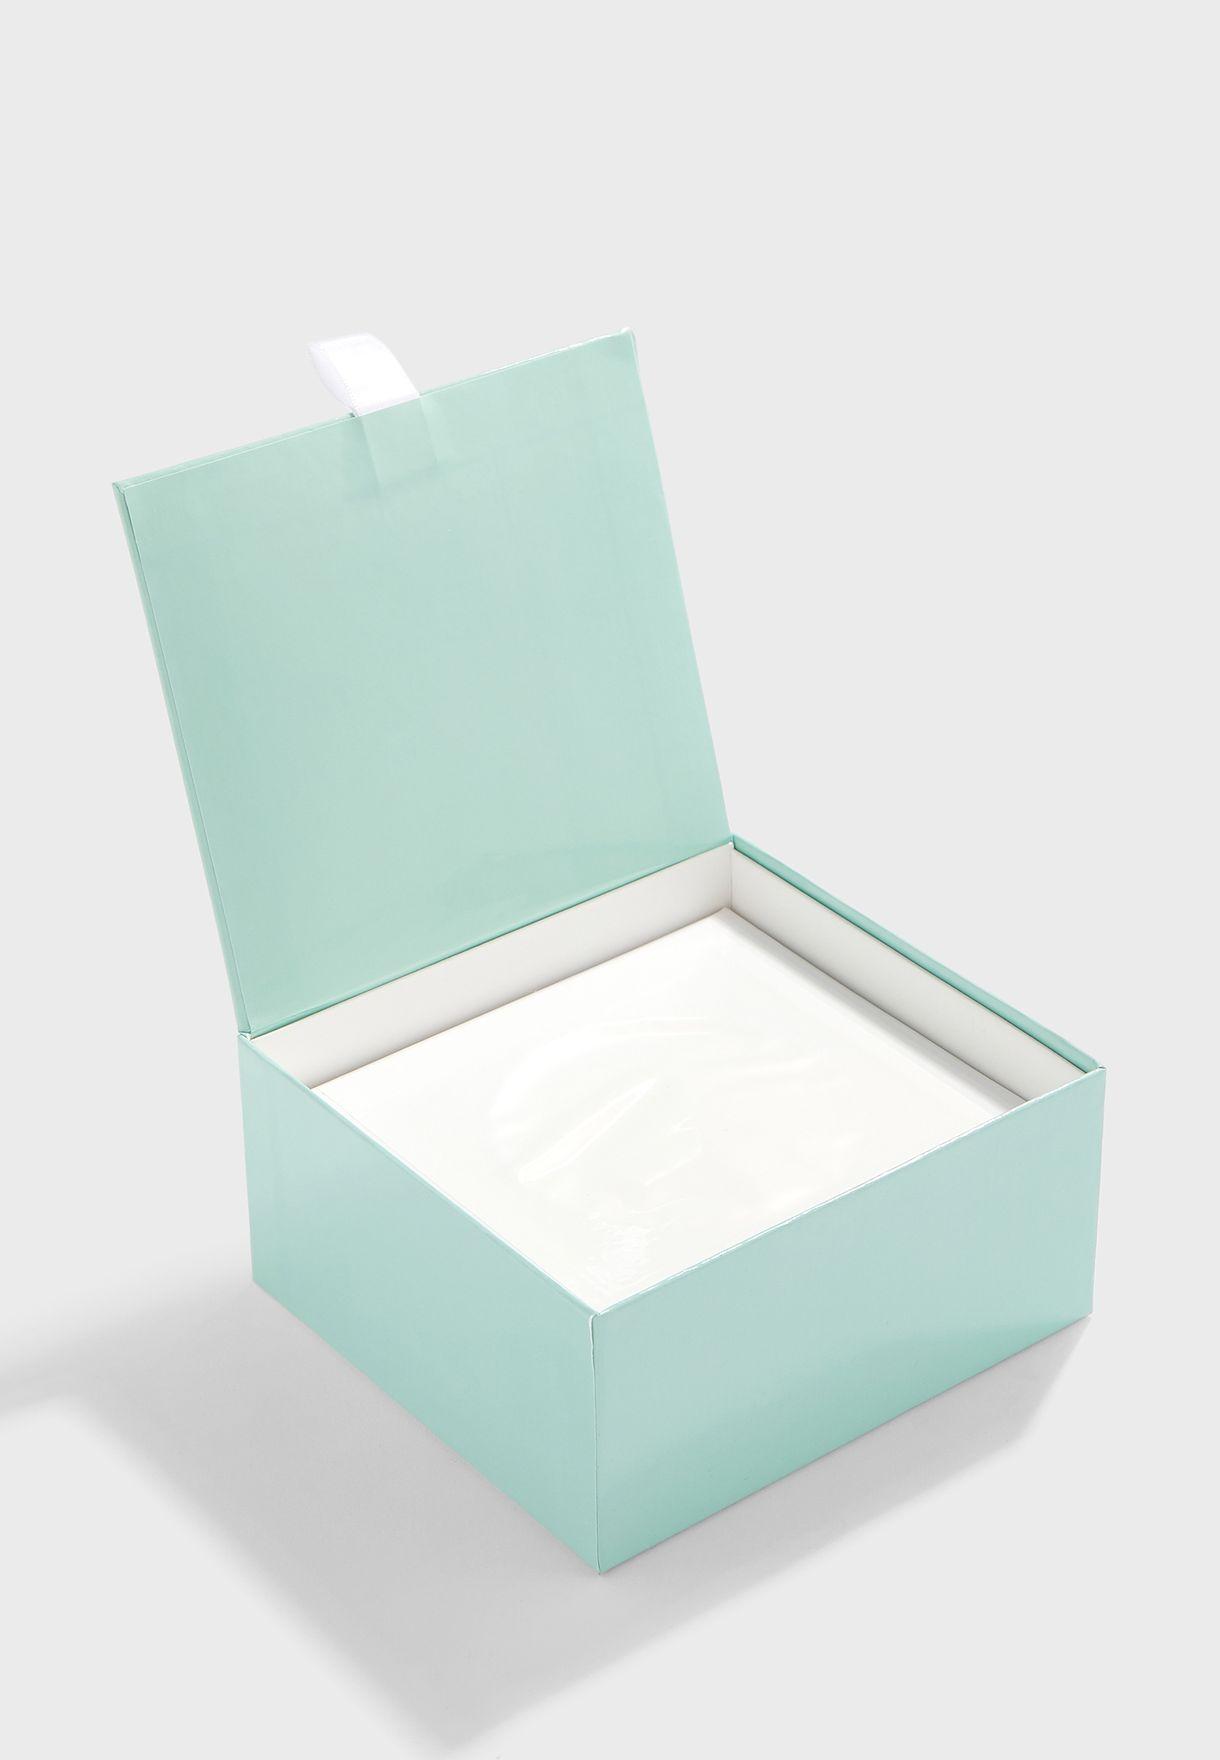 صندوق بودرة يوث ديو -200 جم